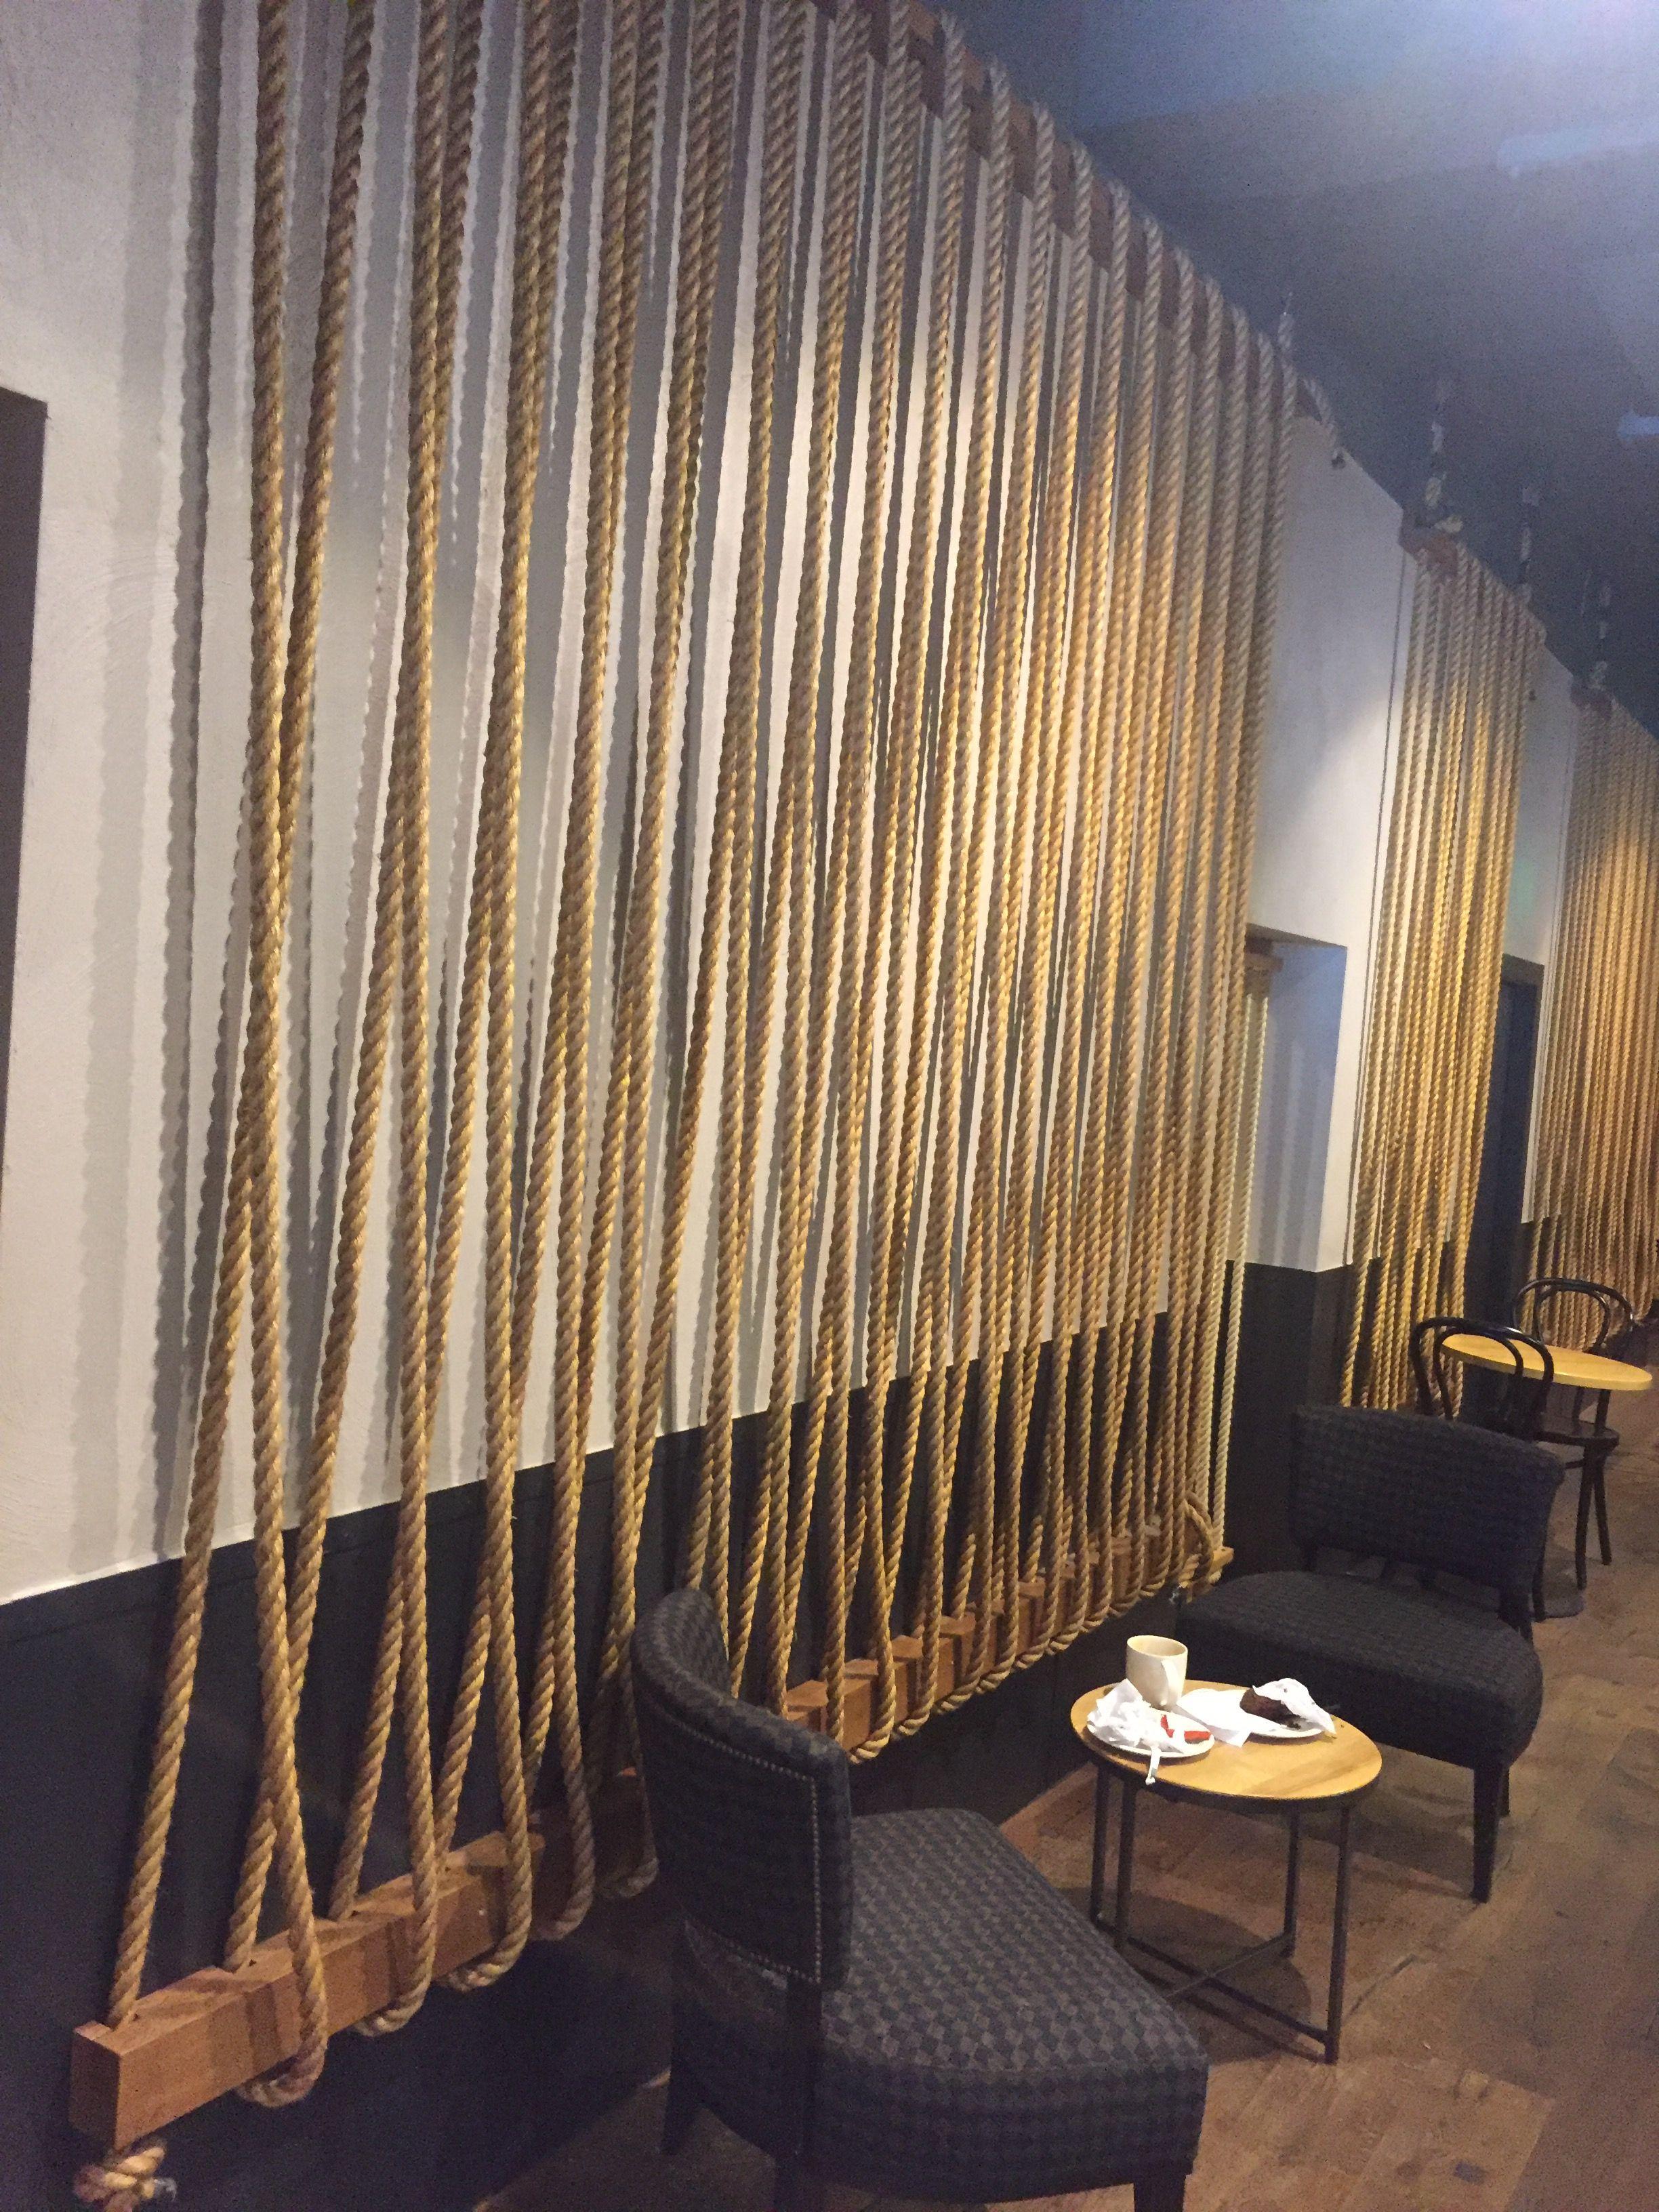 Pin By Tomas Black On Creative Ideas Home Decor Decor Curtains